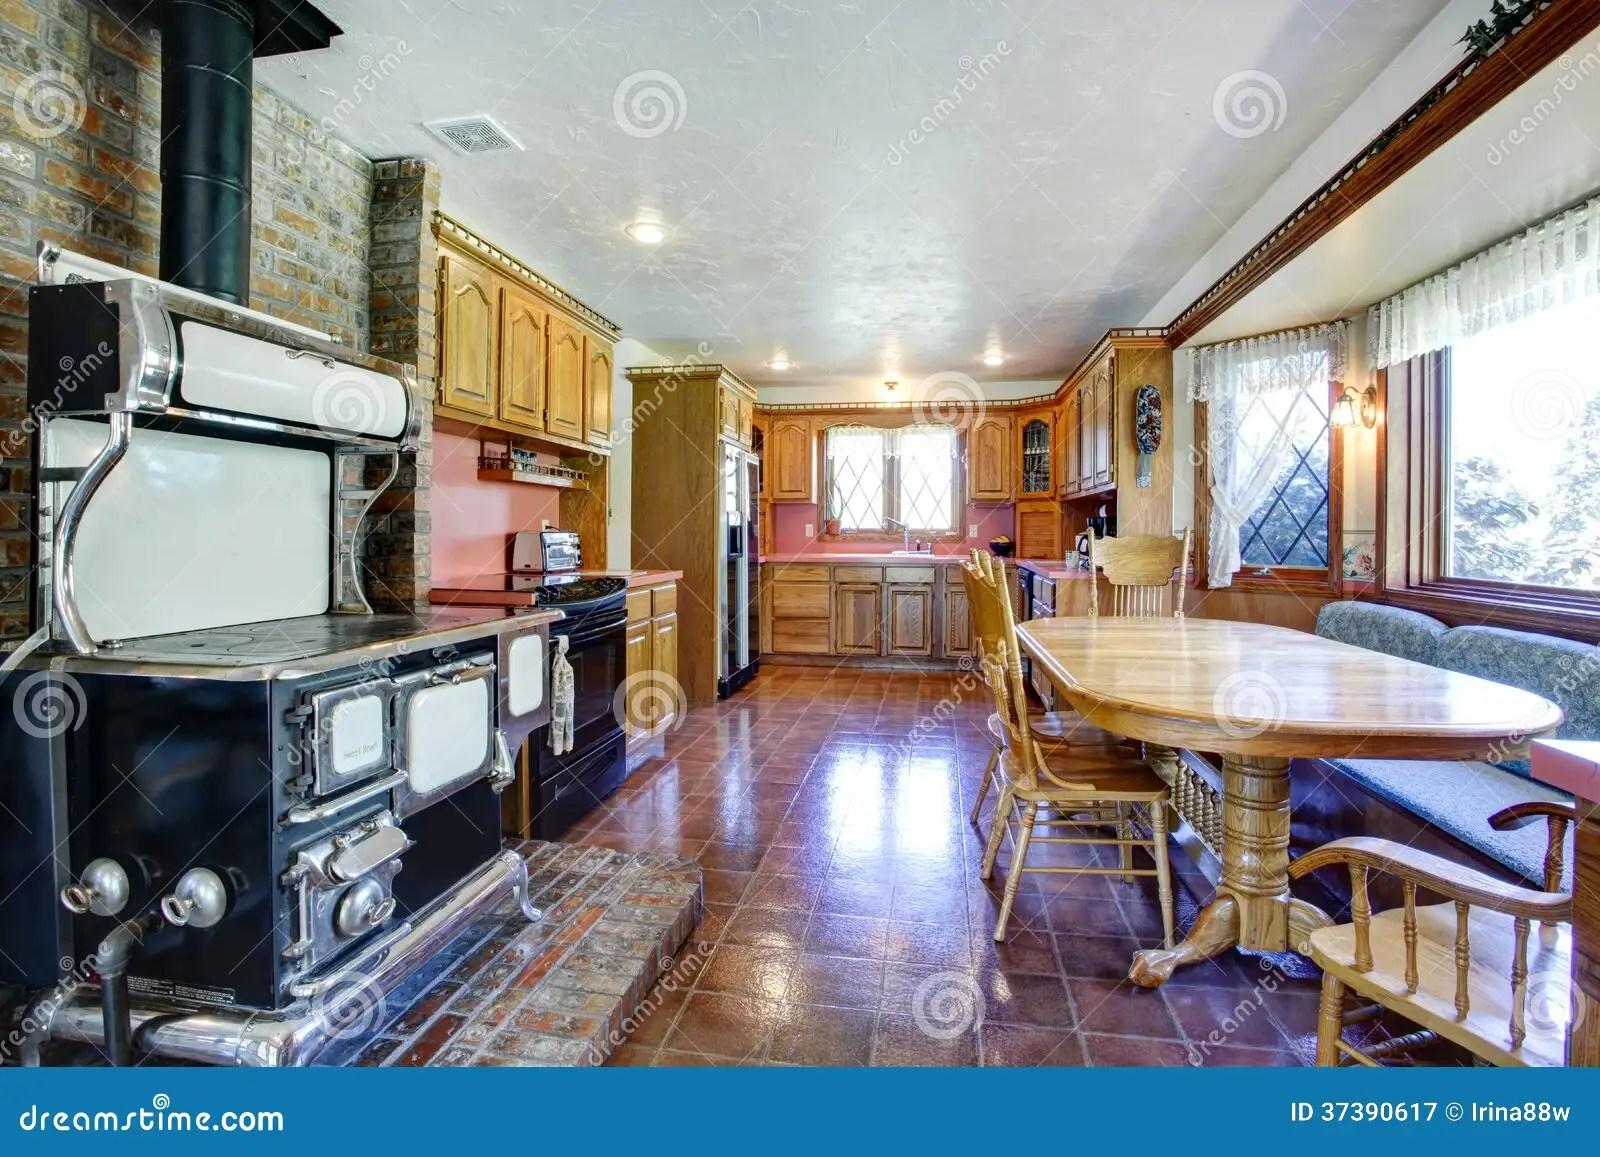 Impressive Farmhouse Kitchen Room With Antique Stove